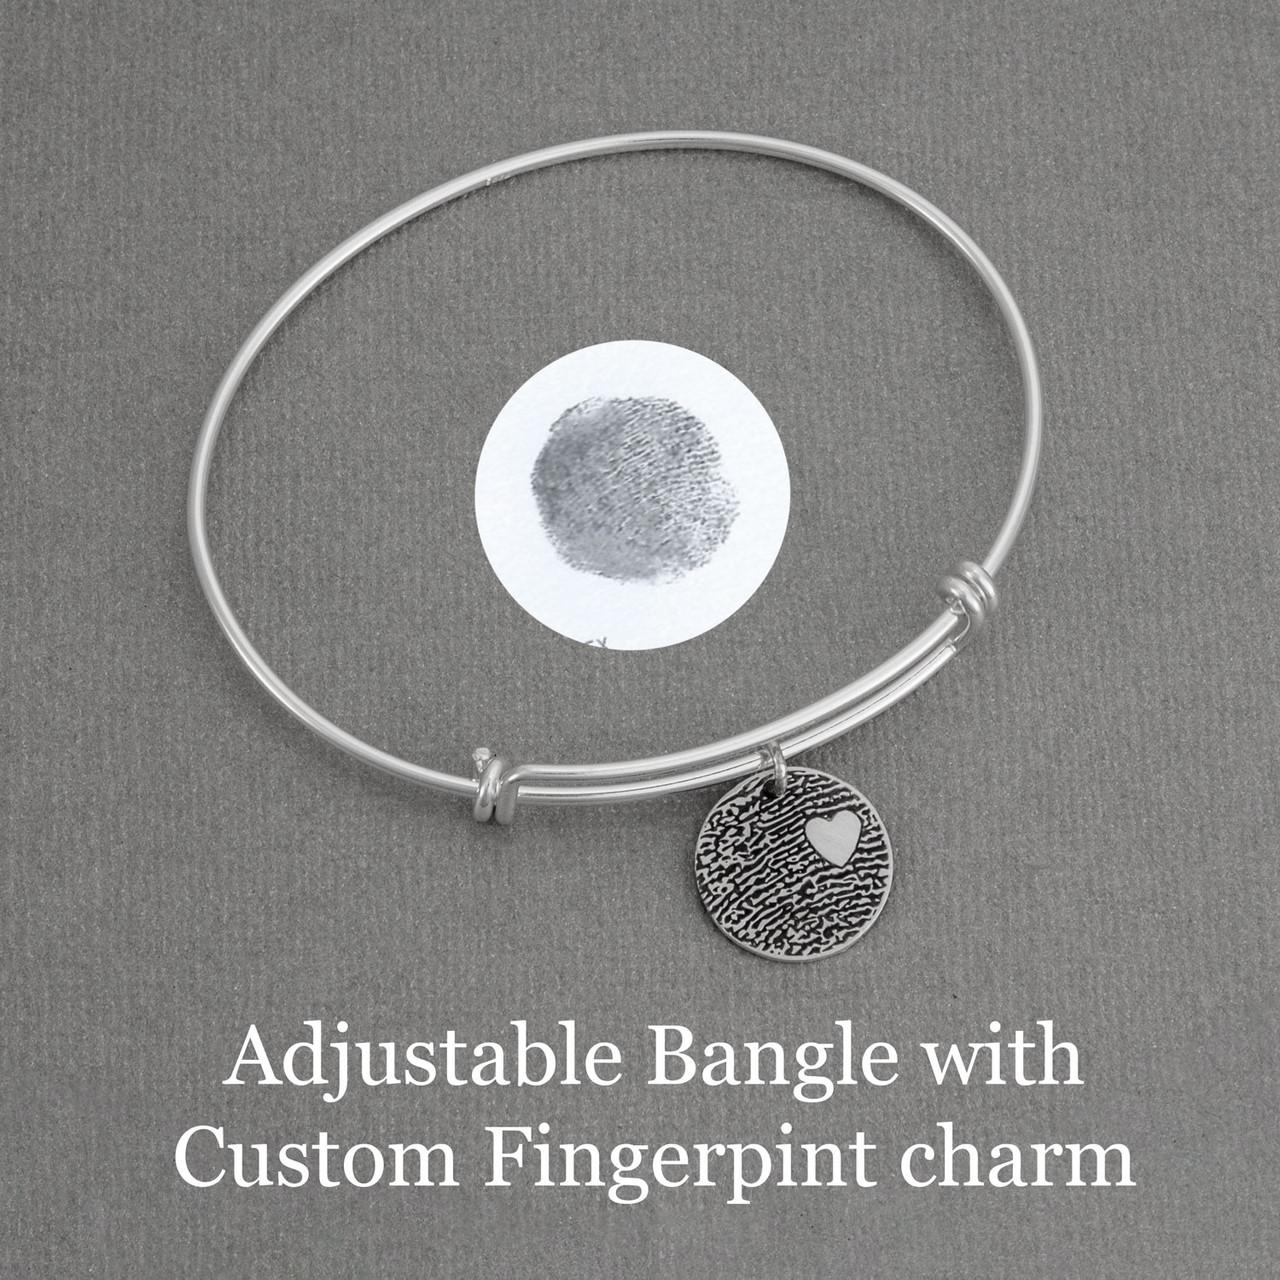 Adjustable Bangle with Custom Fingerprint Charm